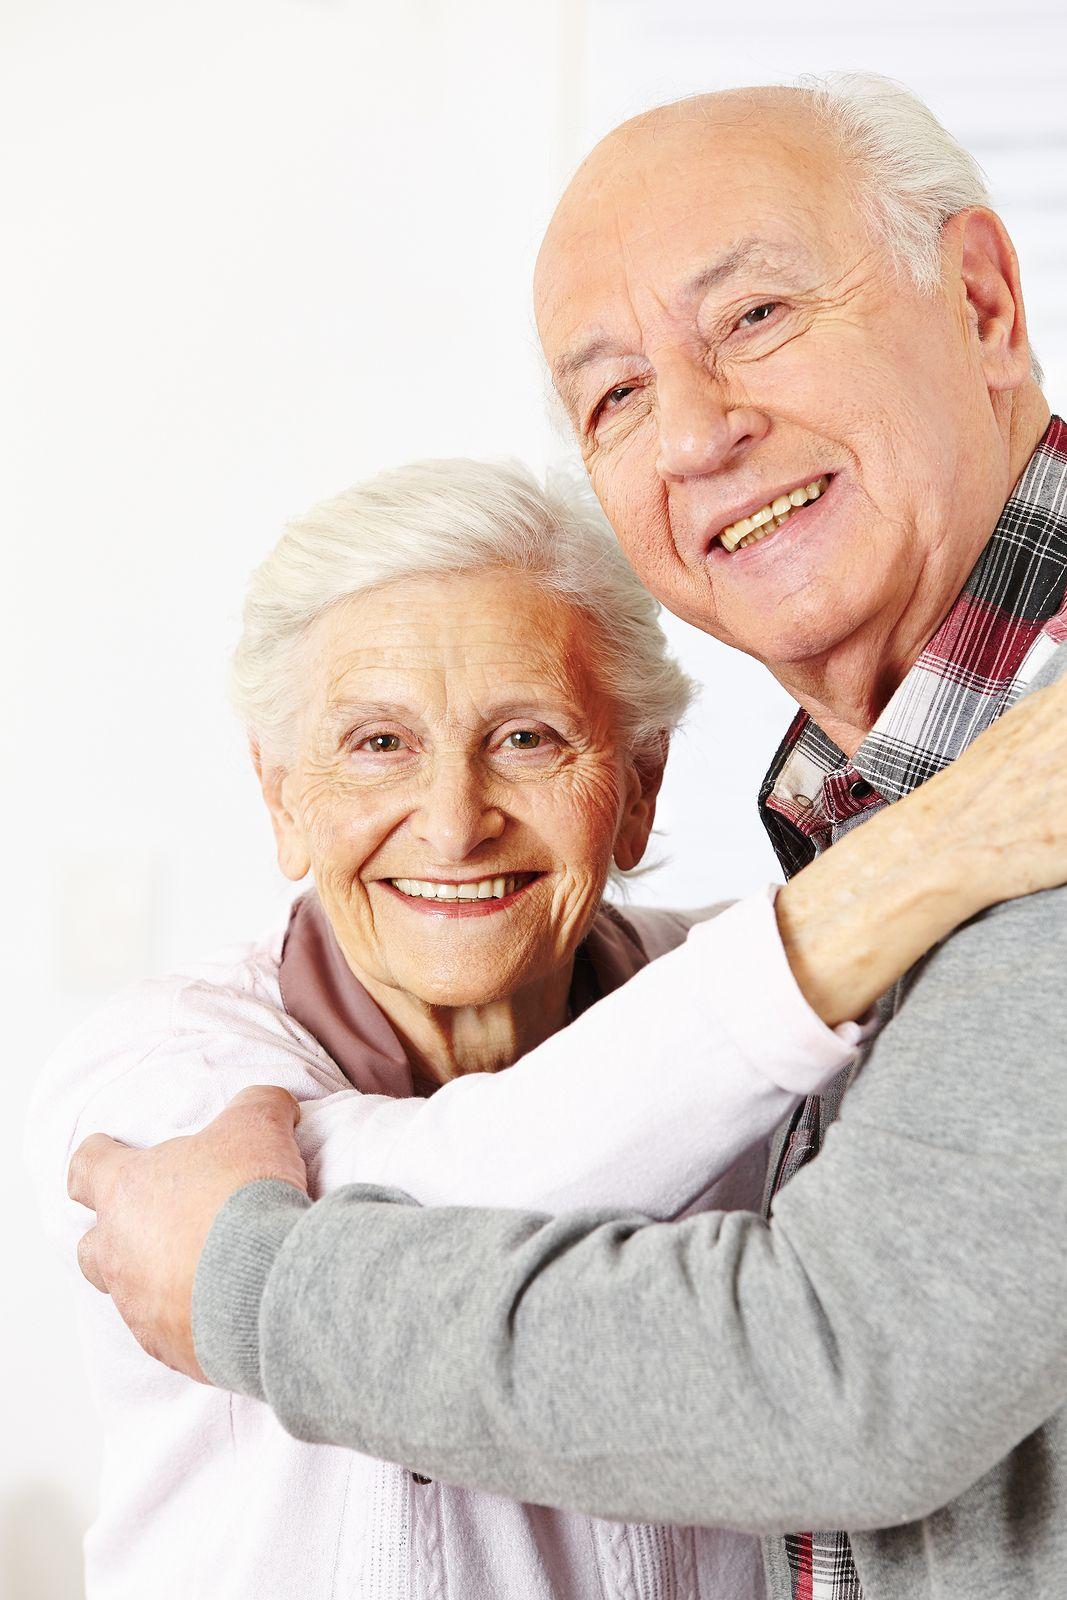 Parkinson's Disease and Dance Long term care insurance